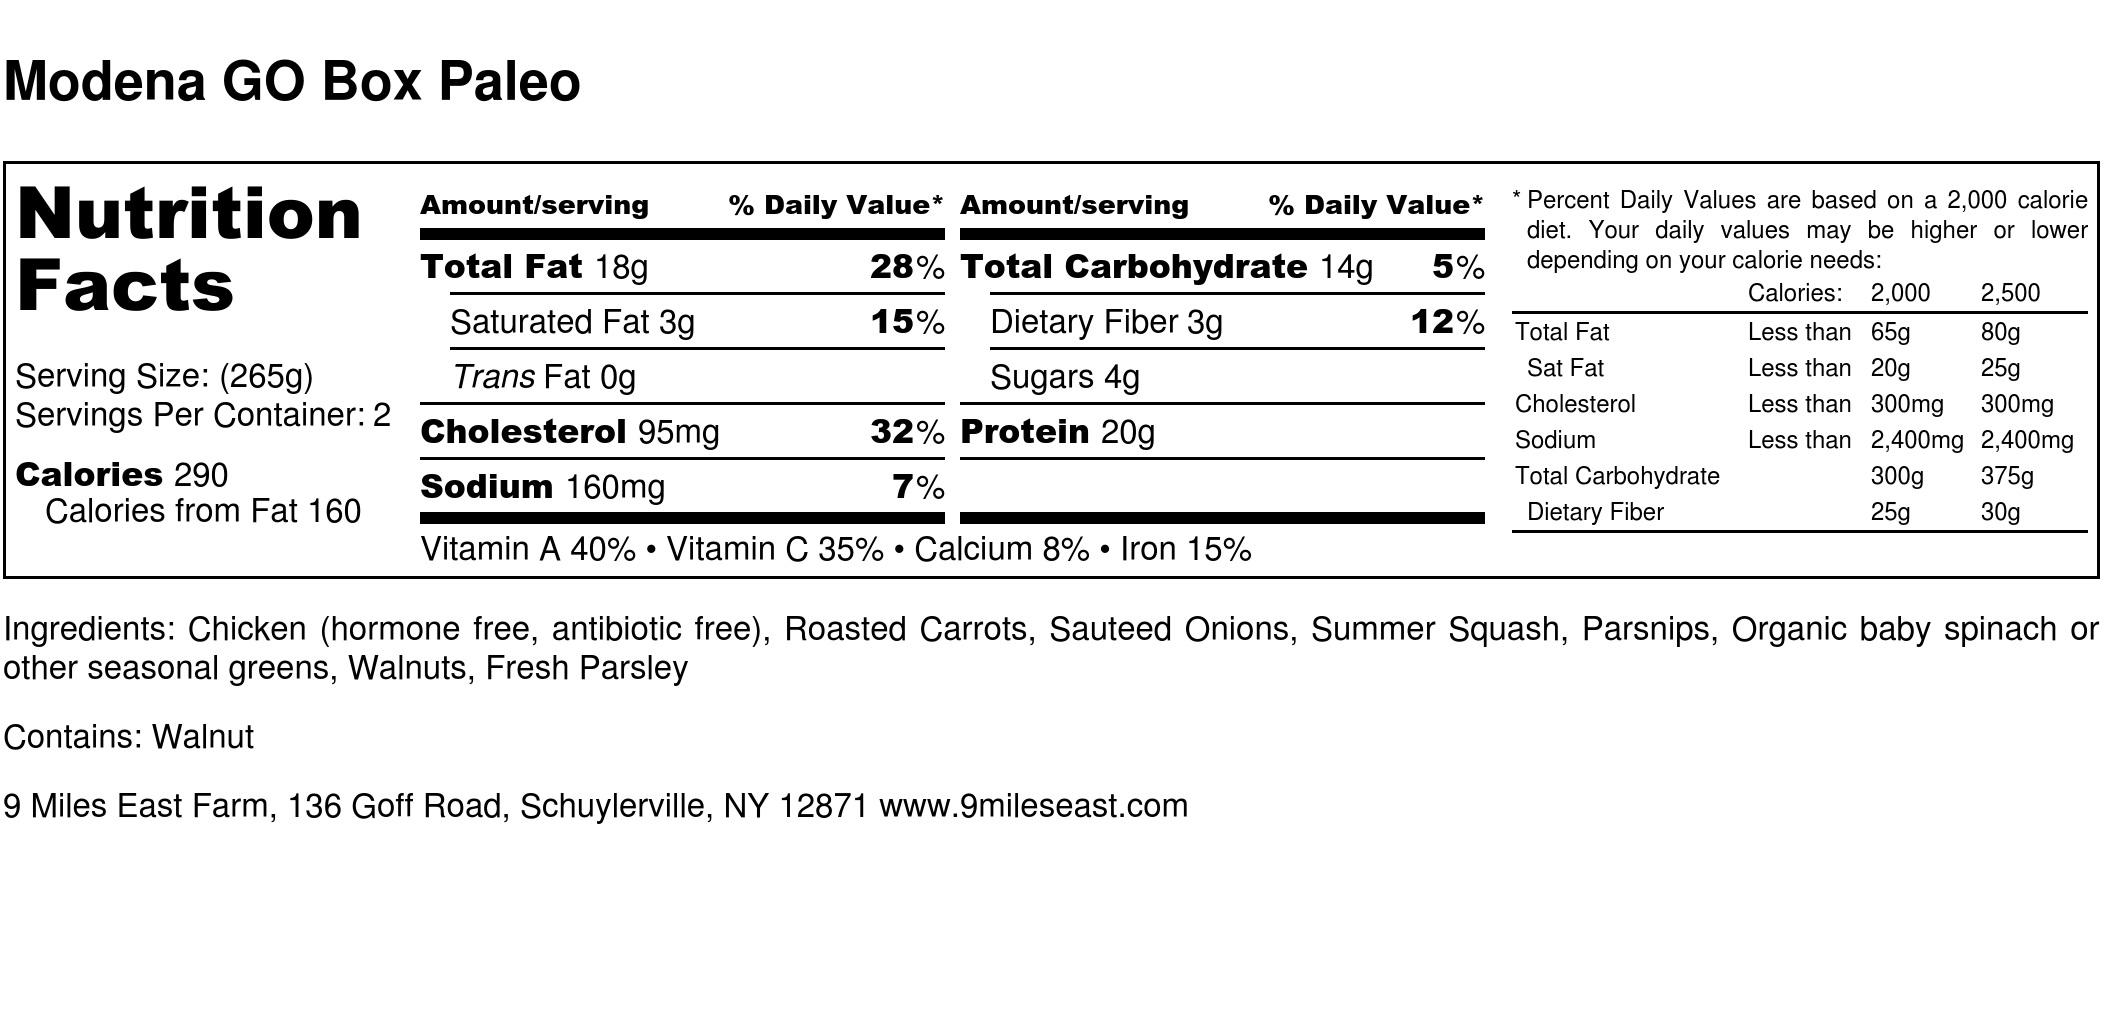 Modena GO Box Paleo - Nutrition Label.jpg